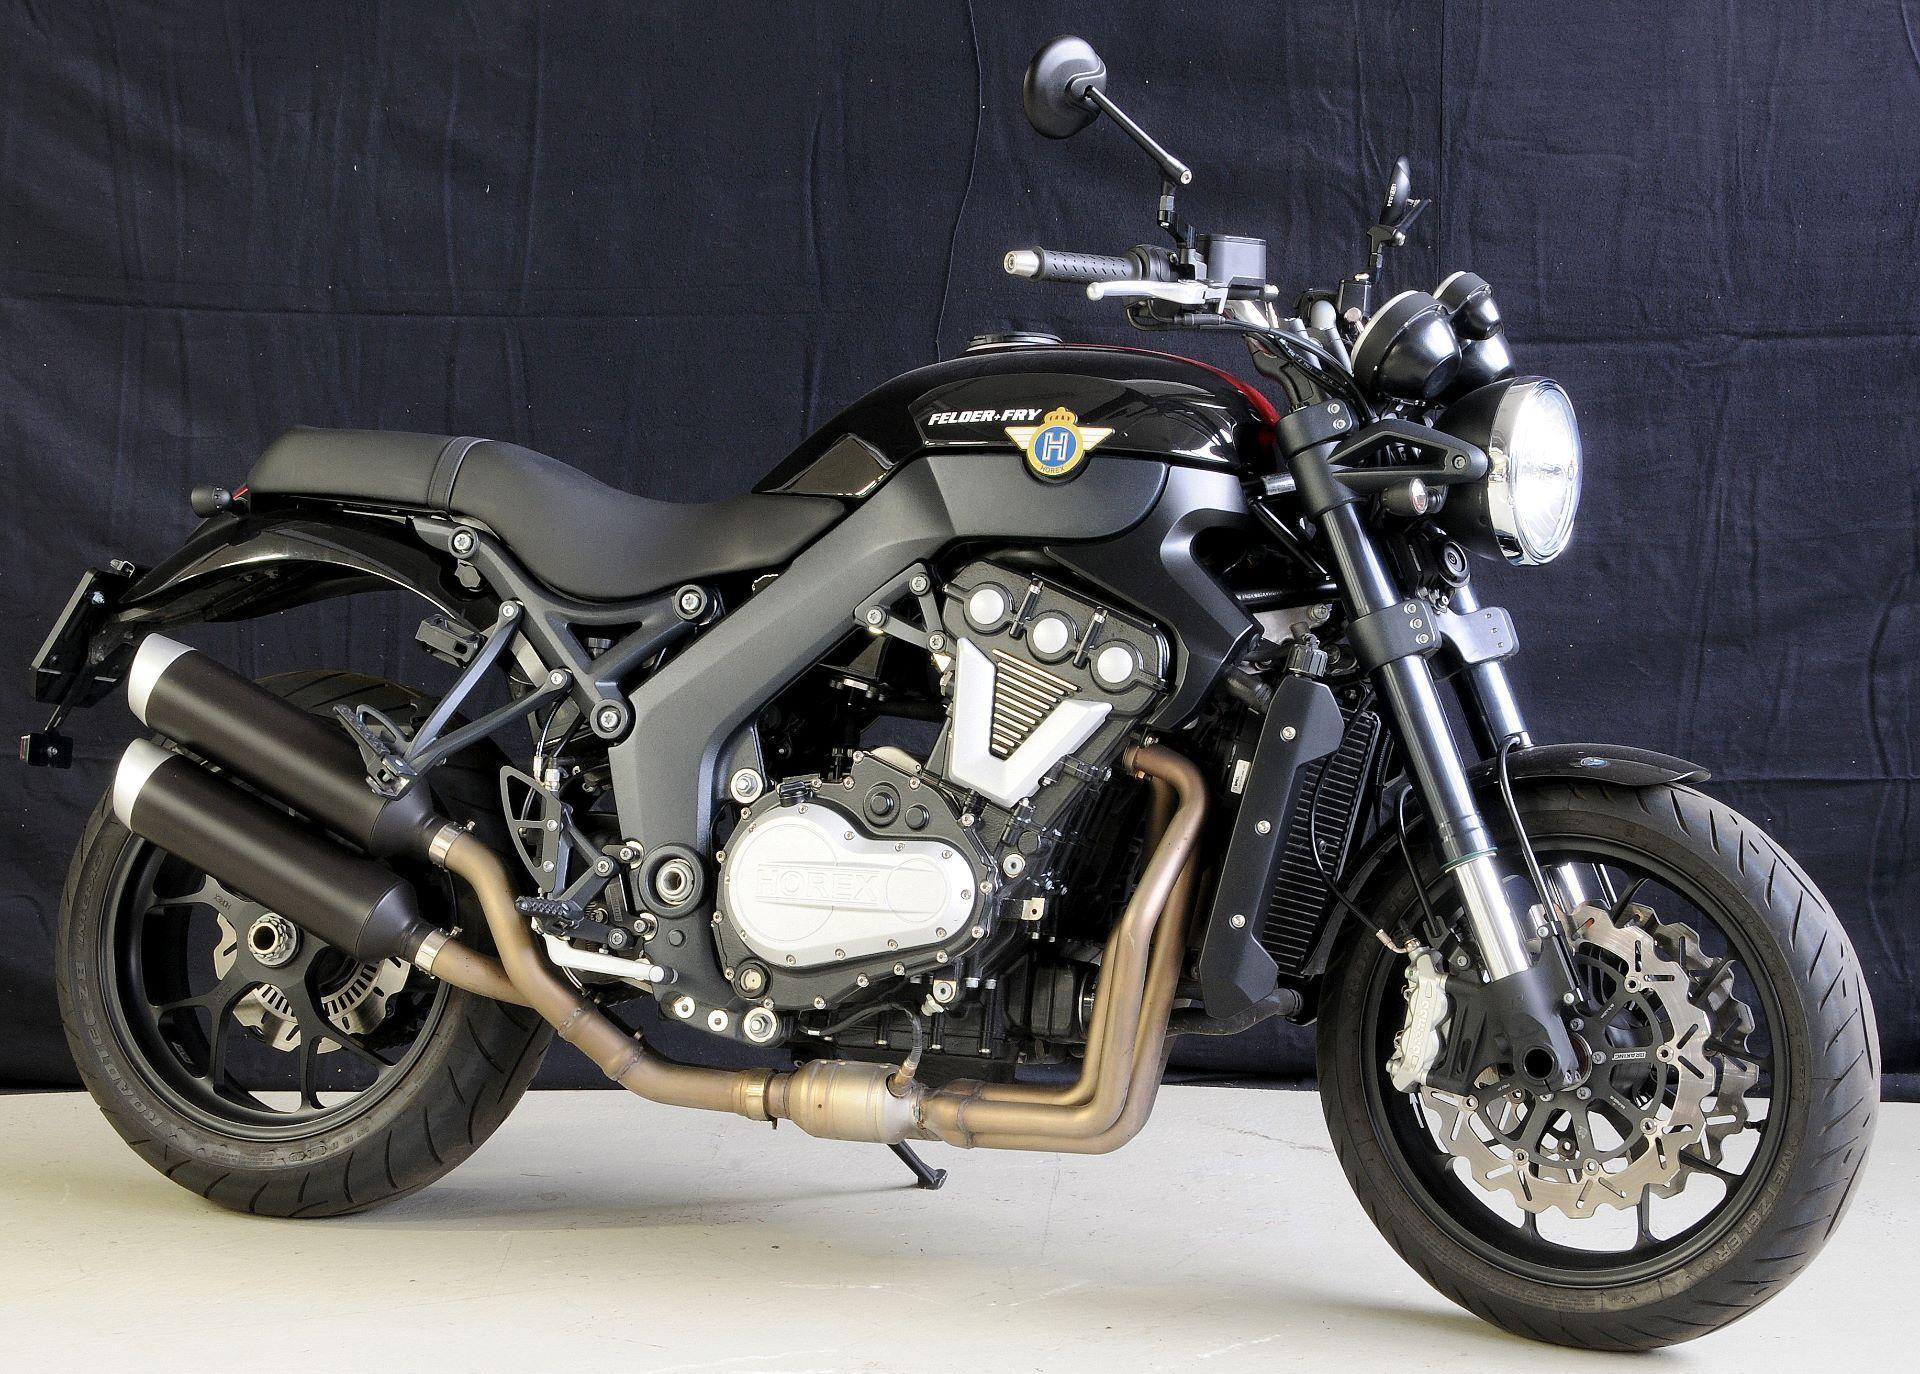 moto occasions acheter horex vr 6 roadster abs felder fry ag obernau. Black Bedroom Furniture Sets. Home Design Ideas